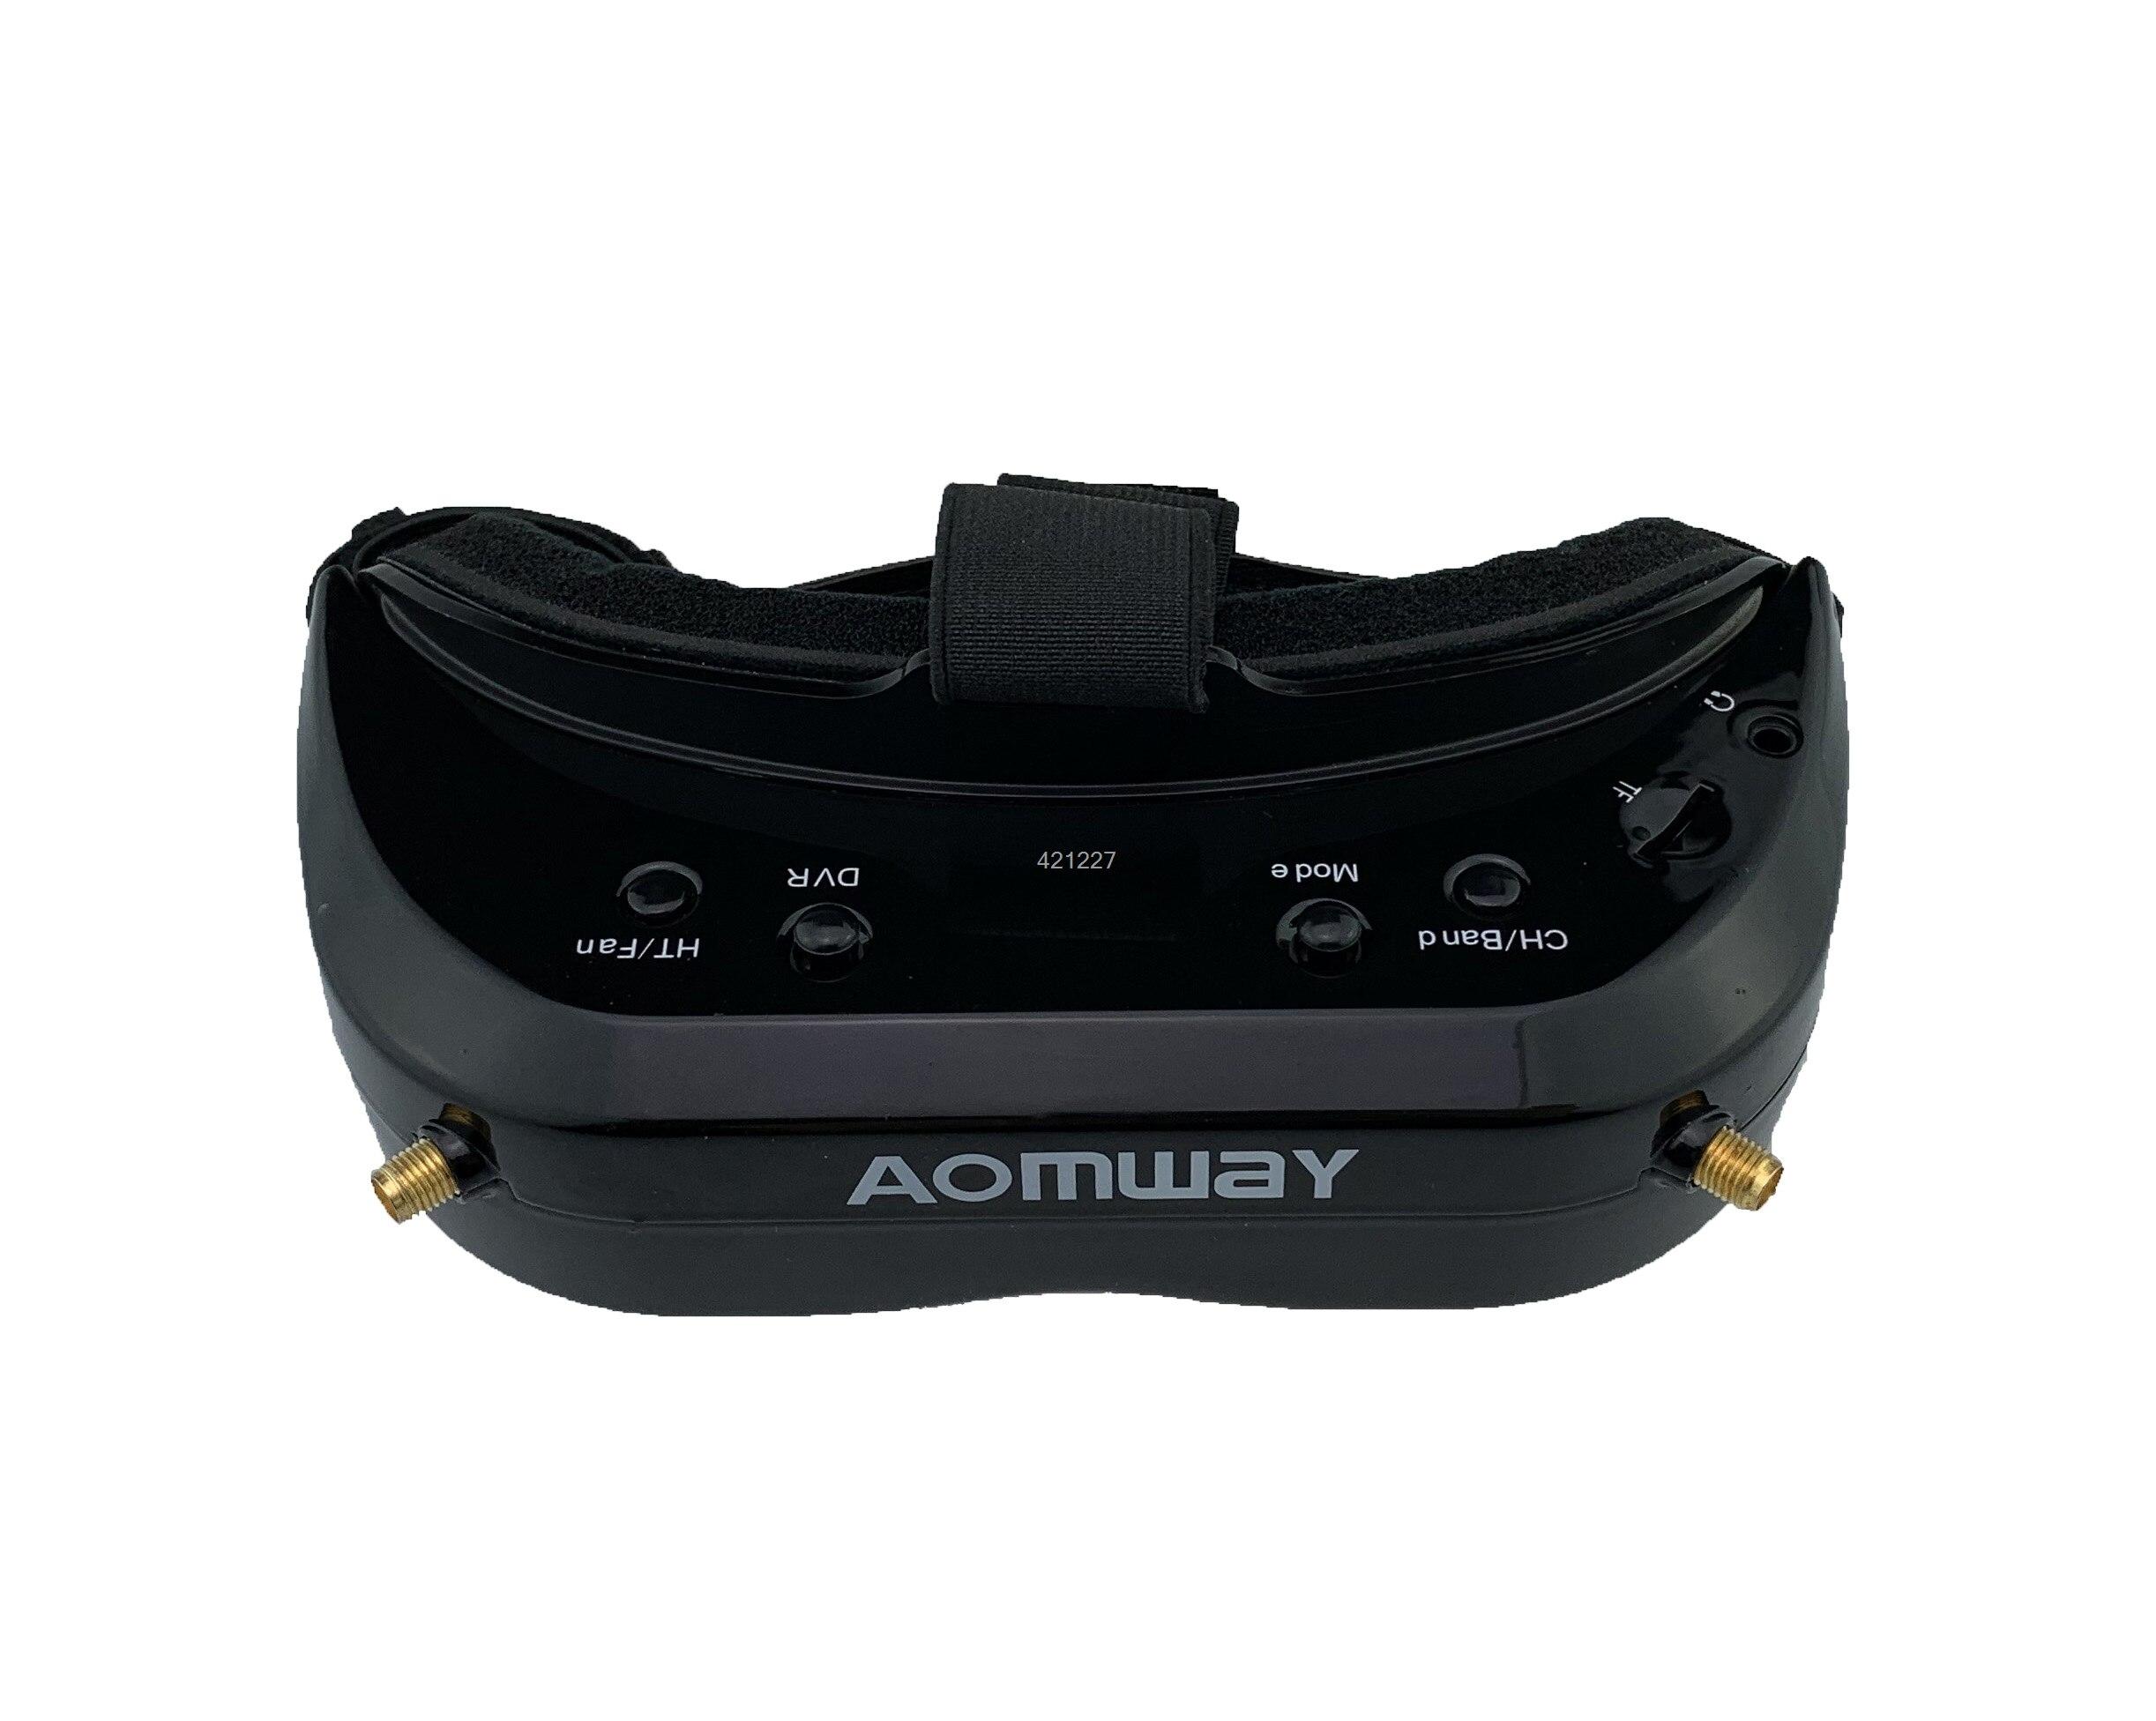 2019 New Aomway Commander Goggles V1S 2D 3D 64CH 5.8G FPV Video Headset Support HDMI 720p DVR Headtracker Instead V1 v2 - 2